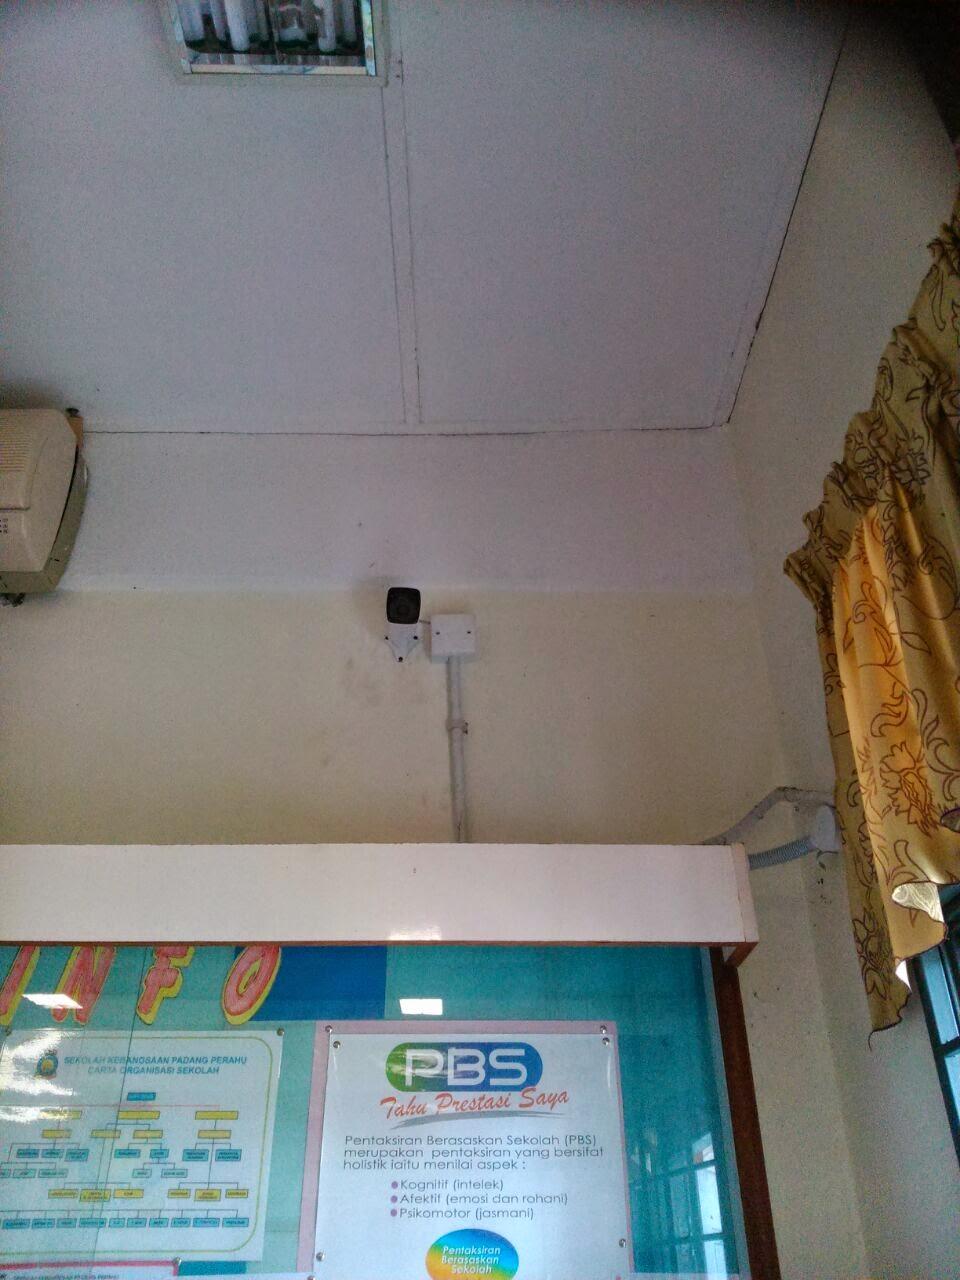 CCTV Pemasangan CCTV Di Sekolah Kebangsaan Padang Perahu